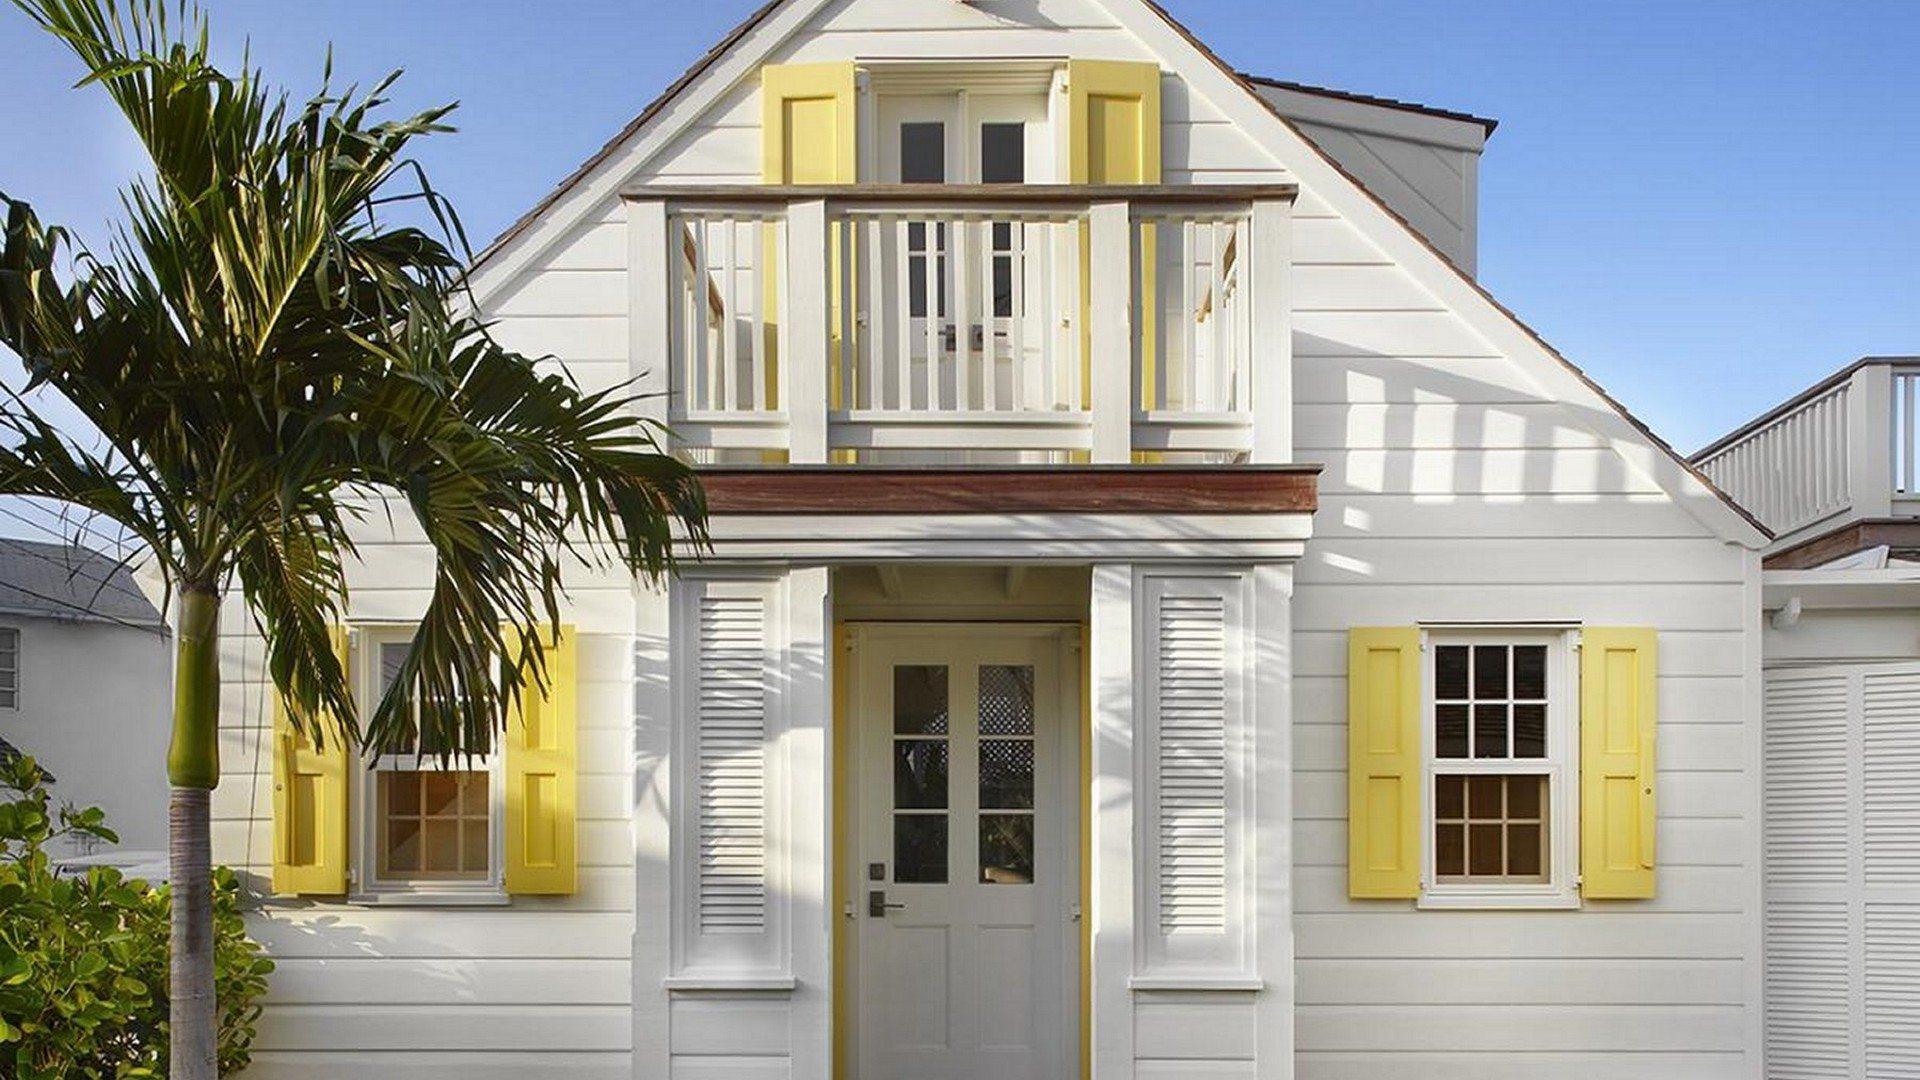 Allamanda-House-Exterior-Harbour-Island-Bahamas-Pamela-Murdock-Villas-UltraVilla